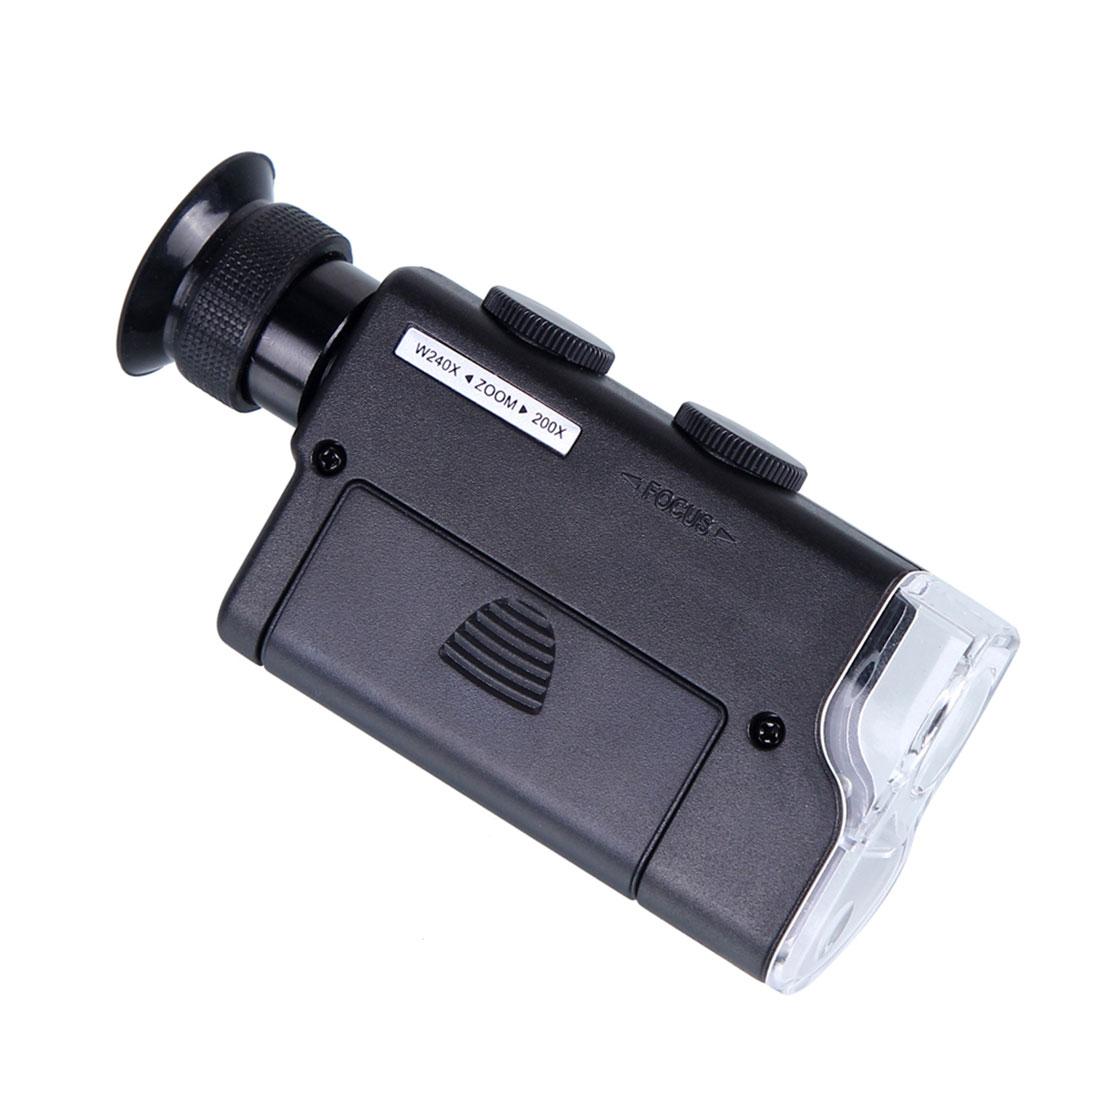 Mini Portátil de Bolso Microscópio 200X ~ 240X Portátil CONDUZIU a Luz Da Lâmpada Lupa Lente Zoom Lupa Lupa Lupa de Bolso